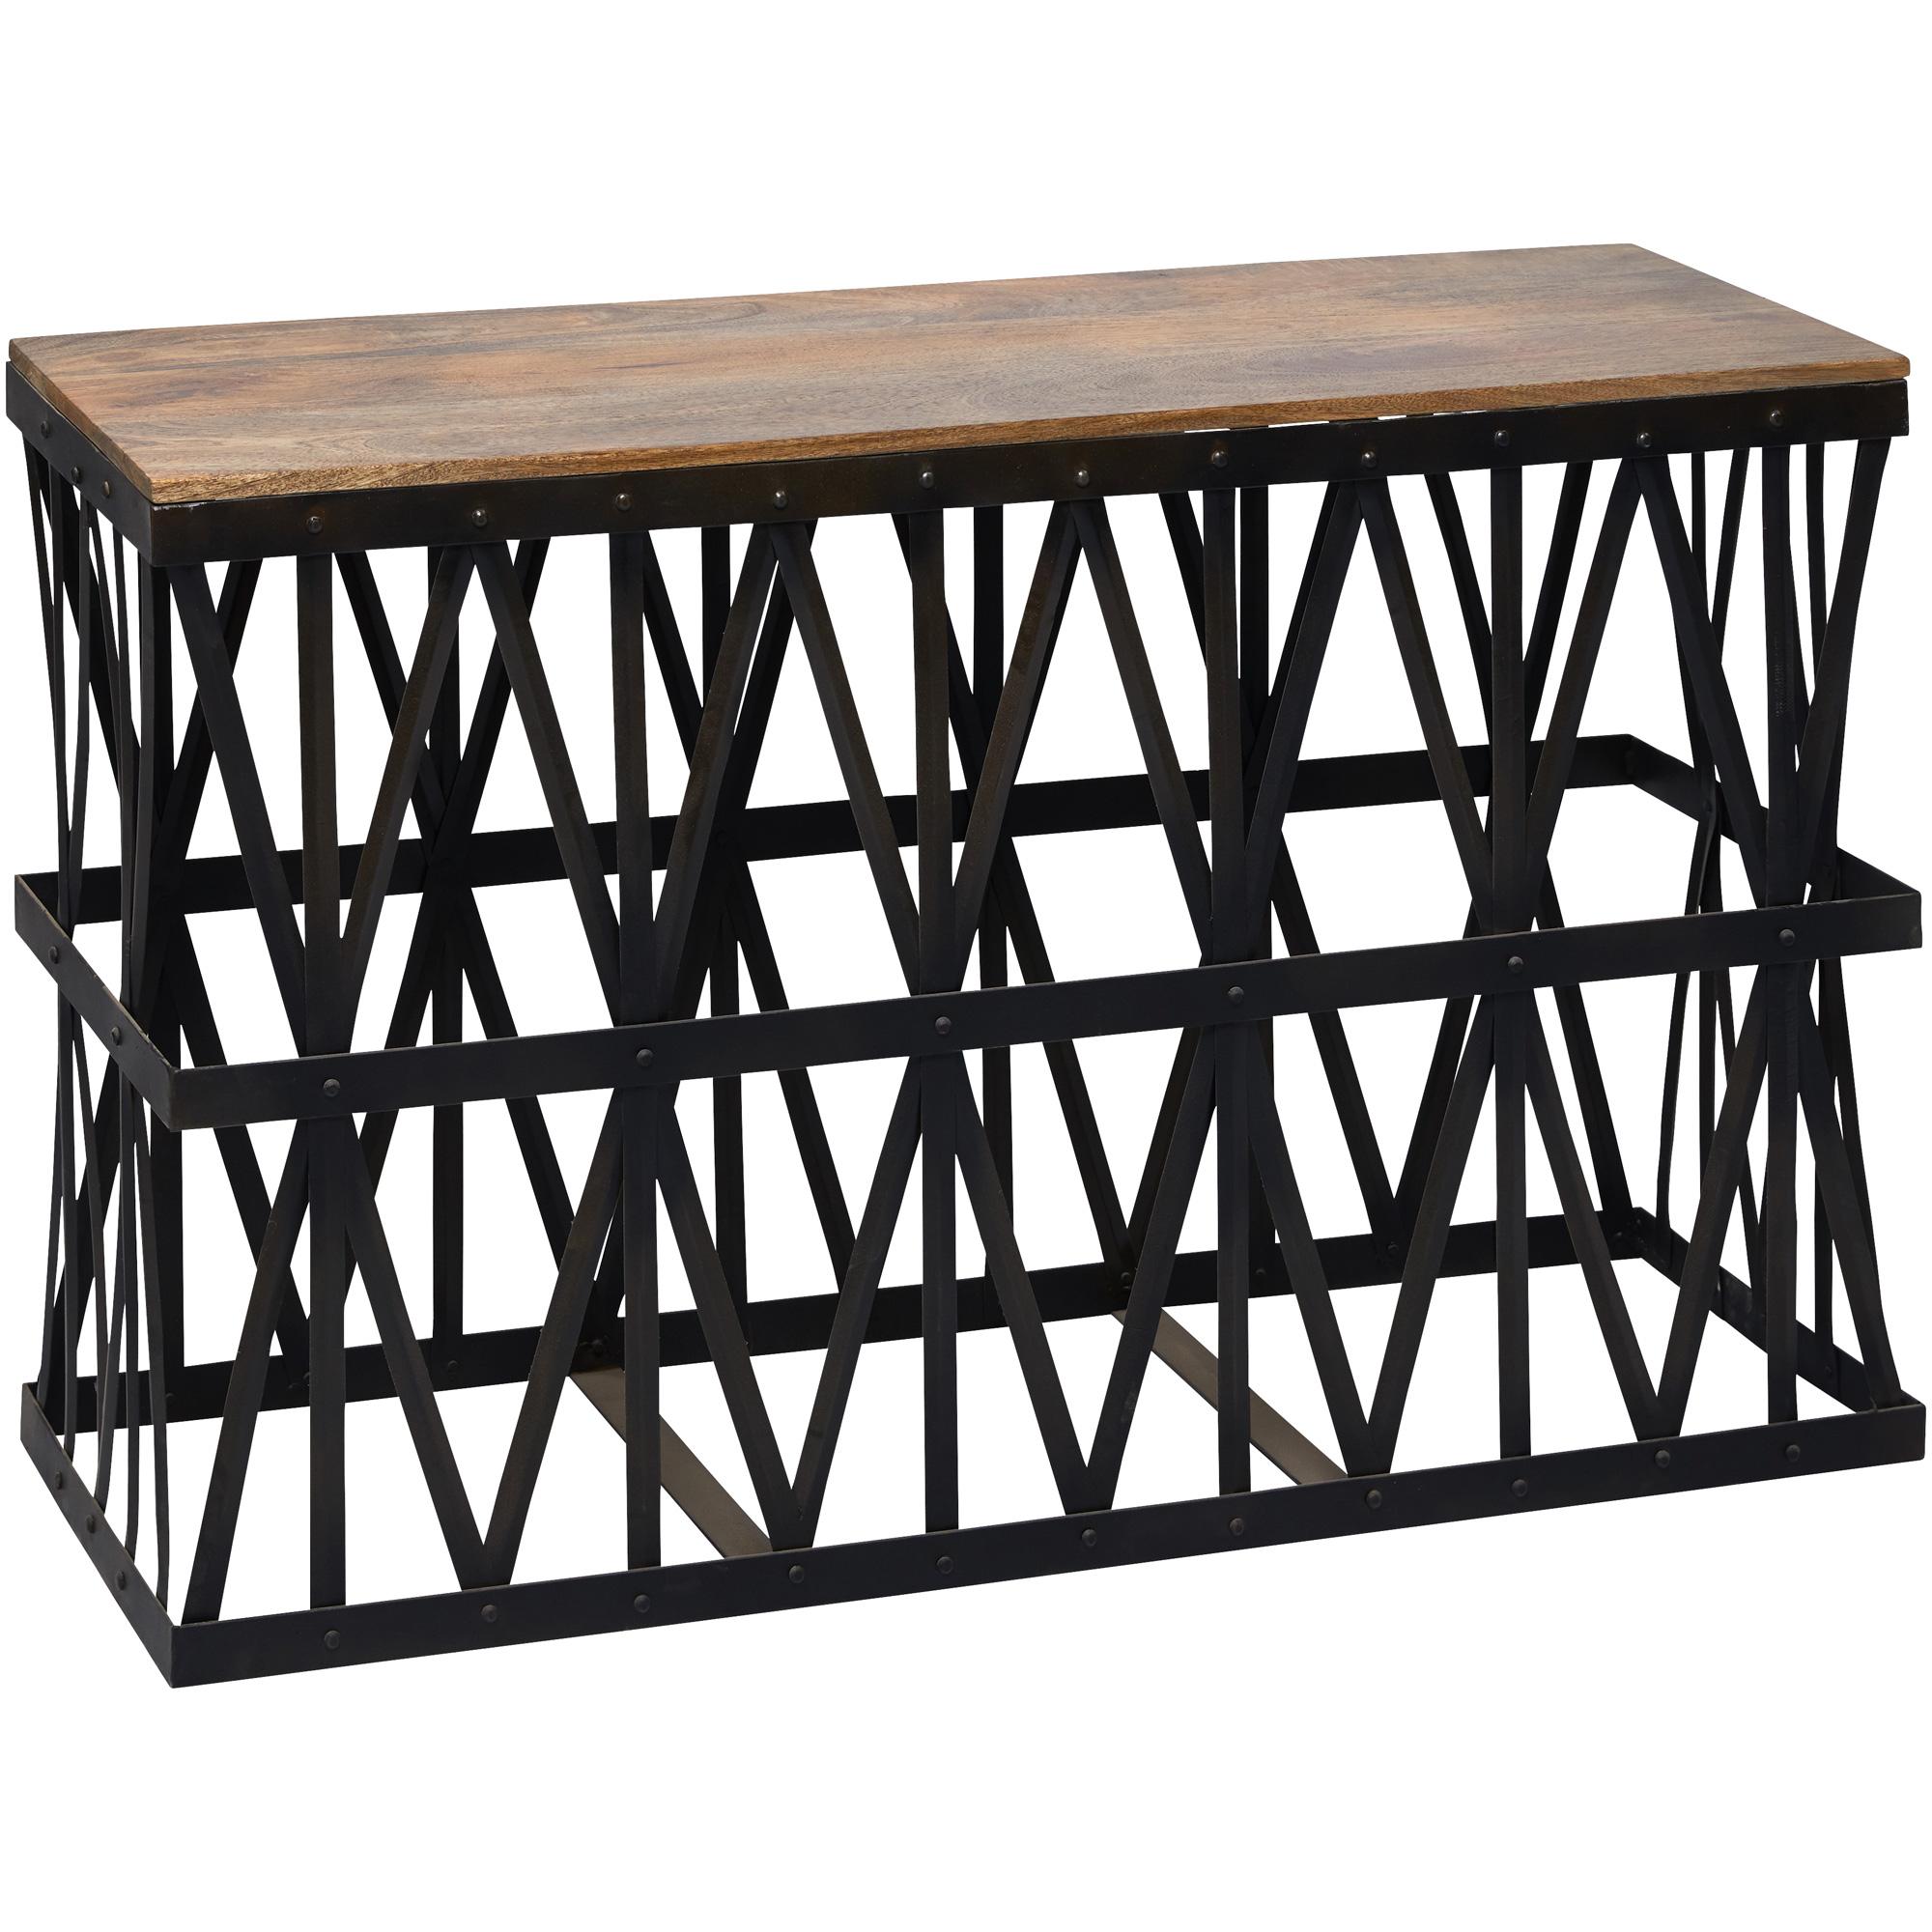 Jaipur Home LLC | Expressive Impressions Black Console Table